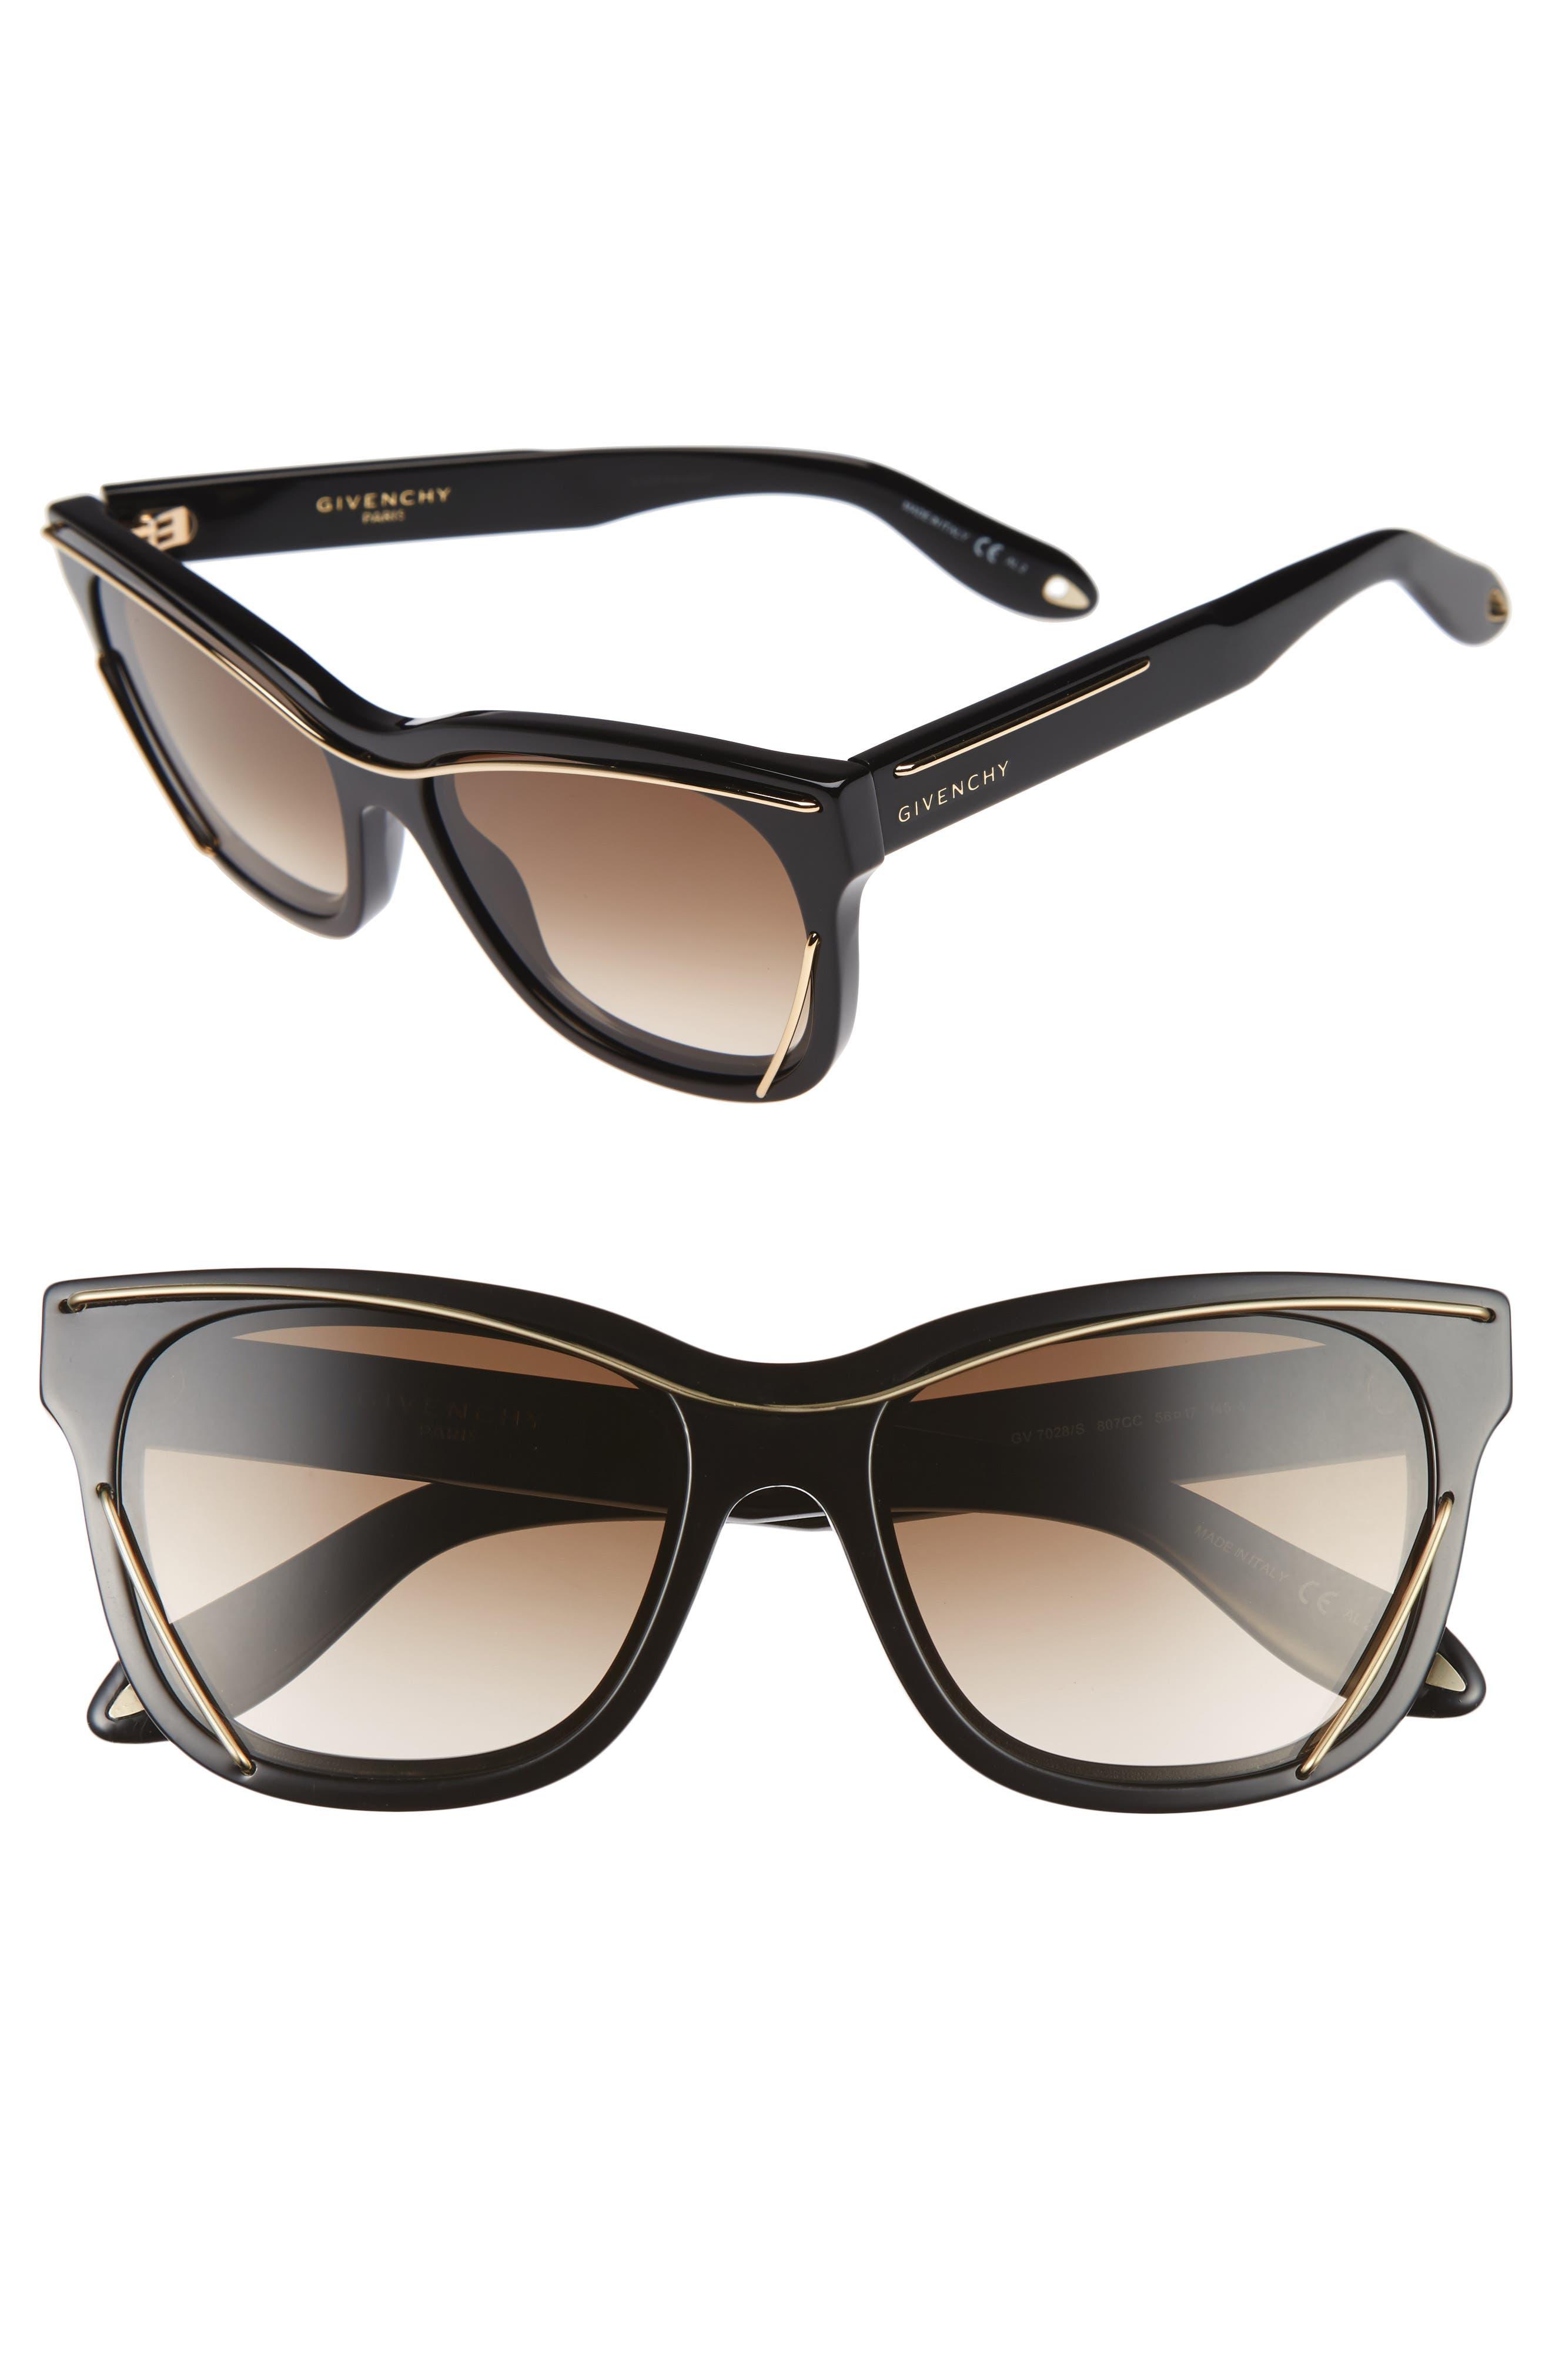 56mm Cat Eye Sunglasses,                             Main thumbnail 1, color,                             002